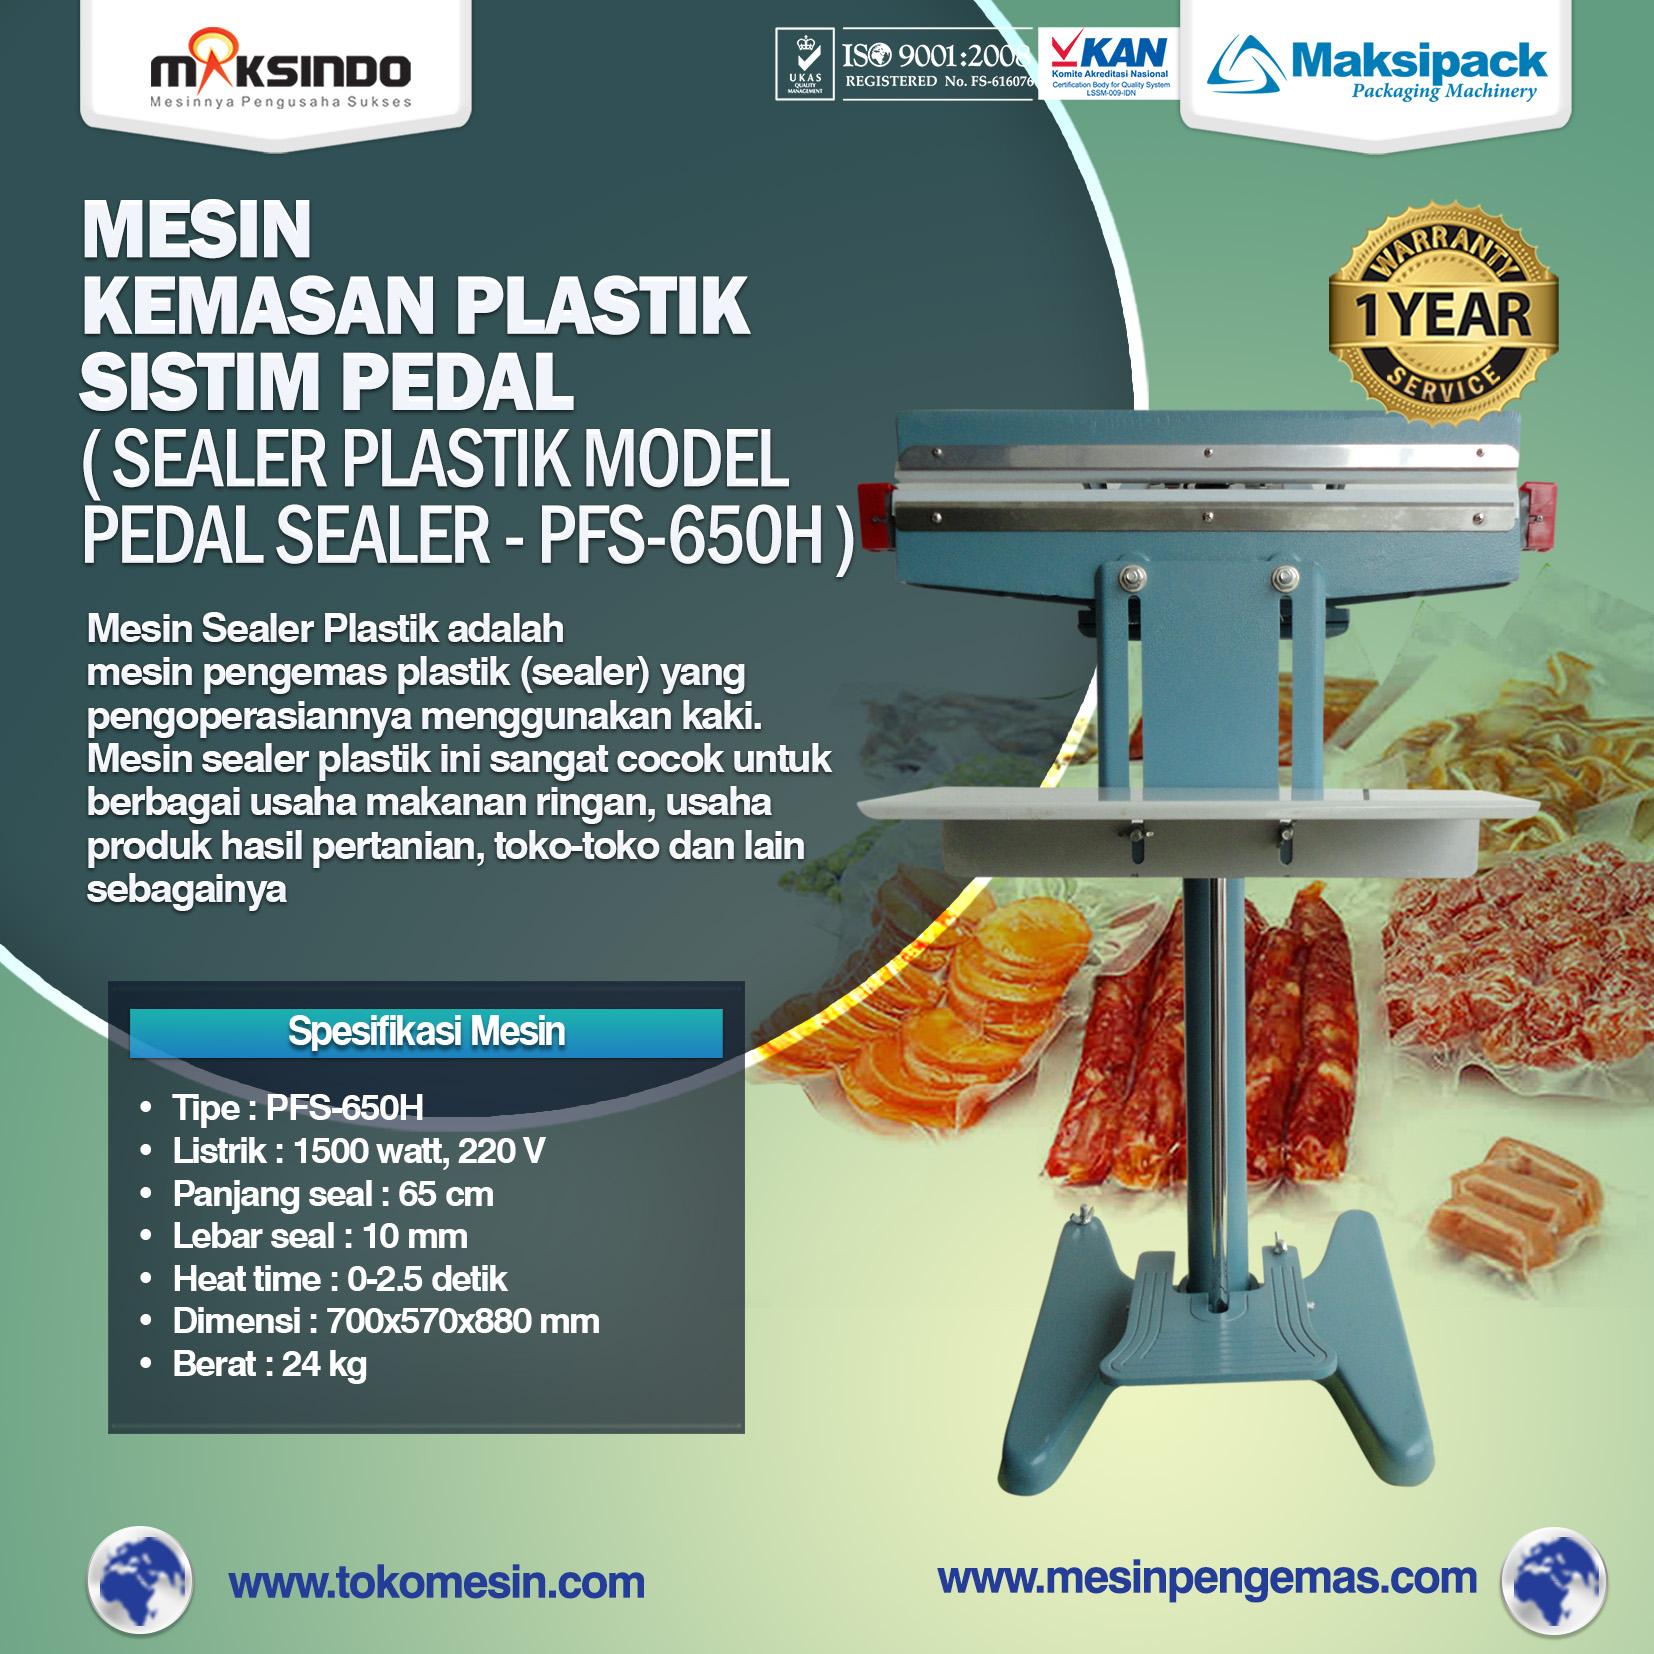 Mesin Sealer Plastik Pedal Sealer PFS-650H